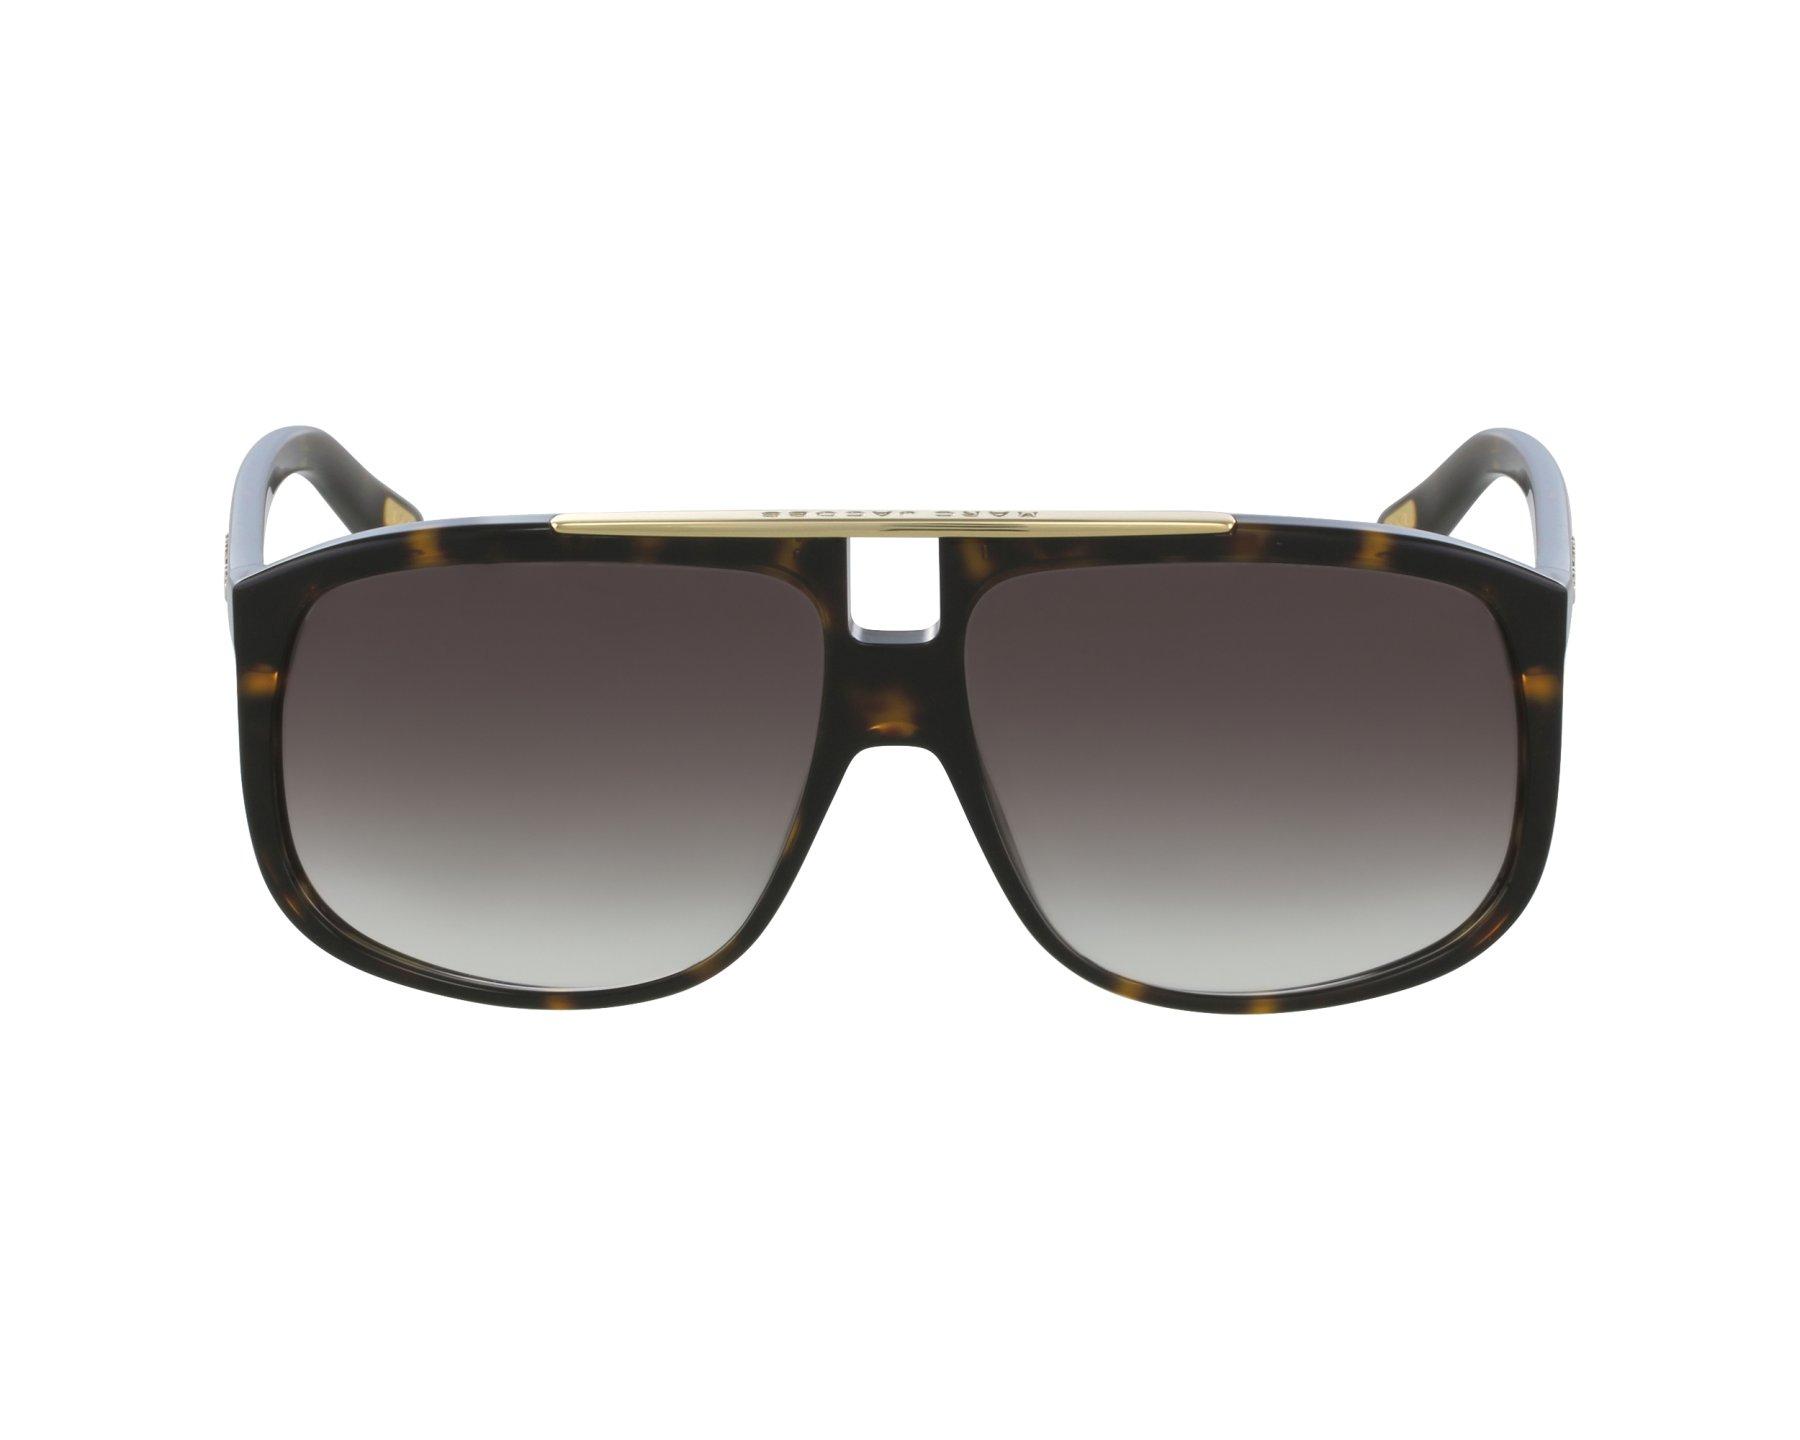 MARC JACOBS Marc Jacobs Sonnenbrille » MJ 252/S«, braun, 086/JS - braun/braun